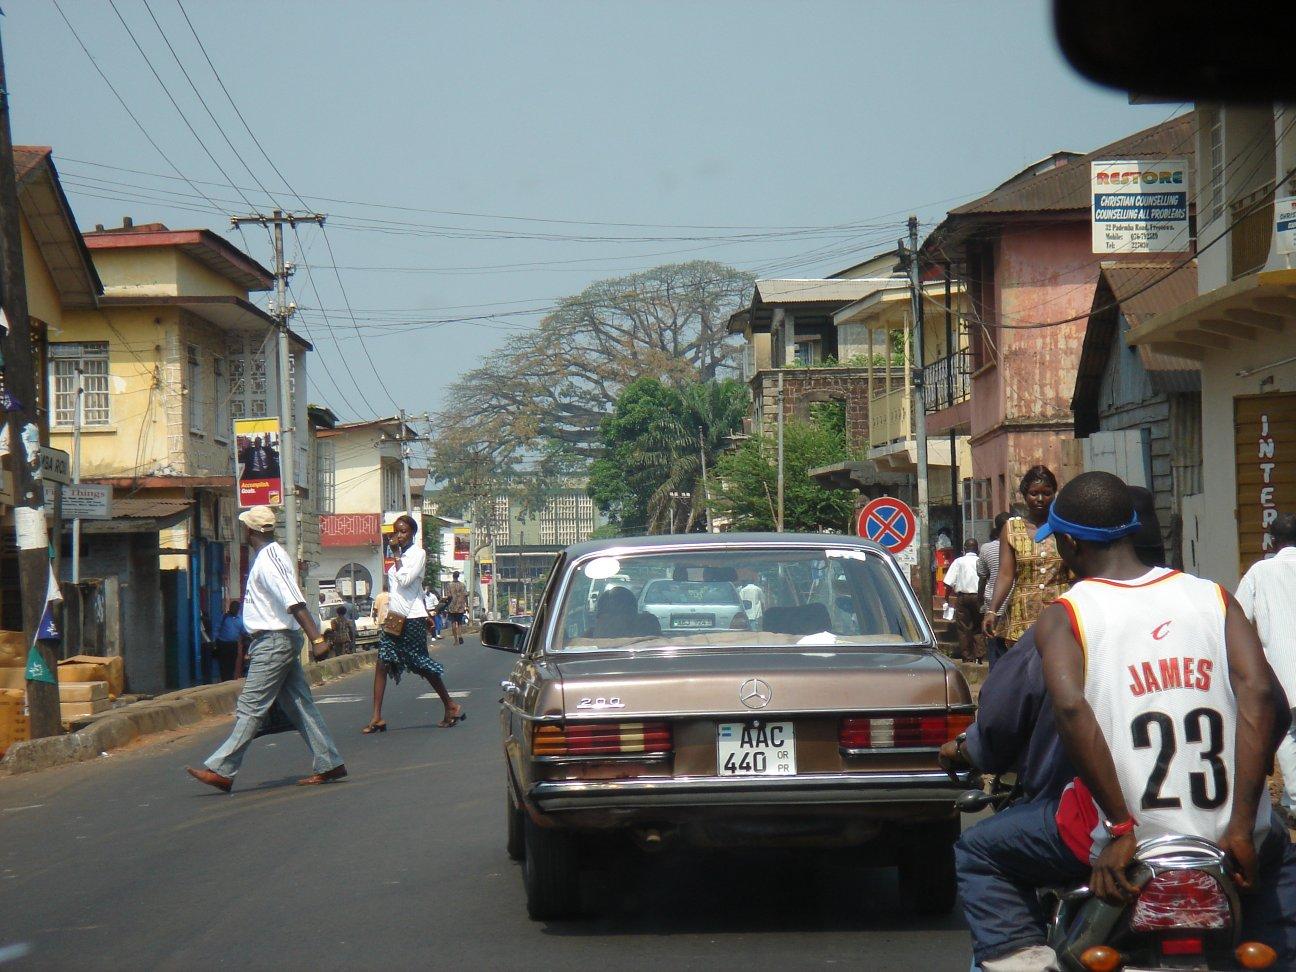 http://upload.wikimedia.org/wikipedia/commons/9/96/Freetownstreet.jpg